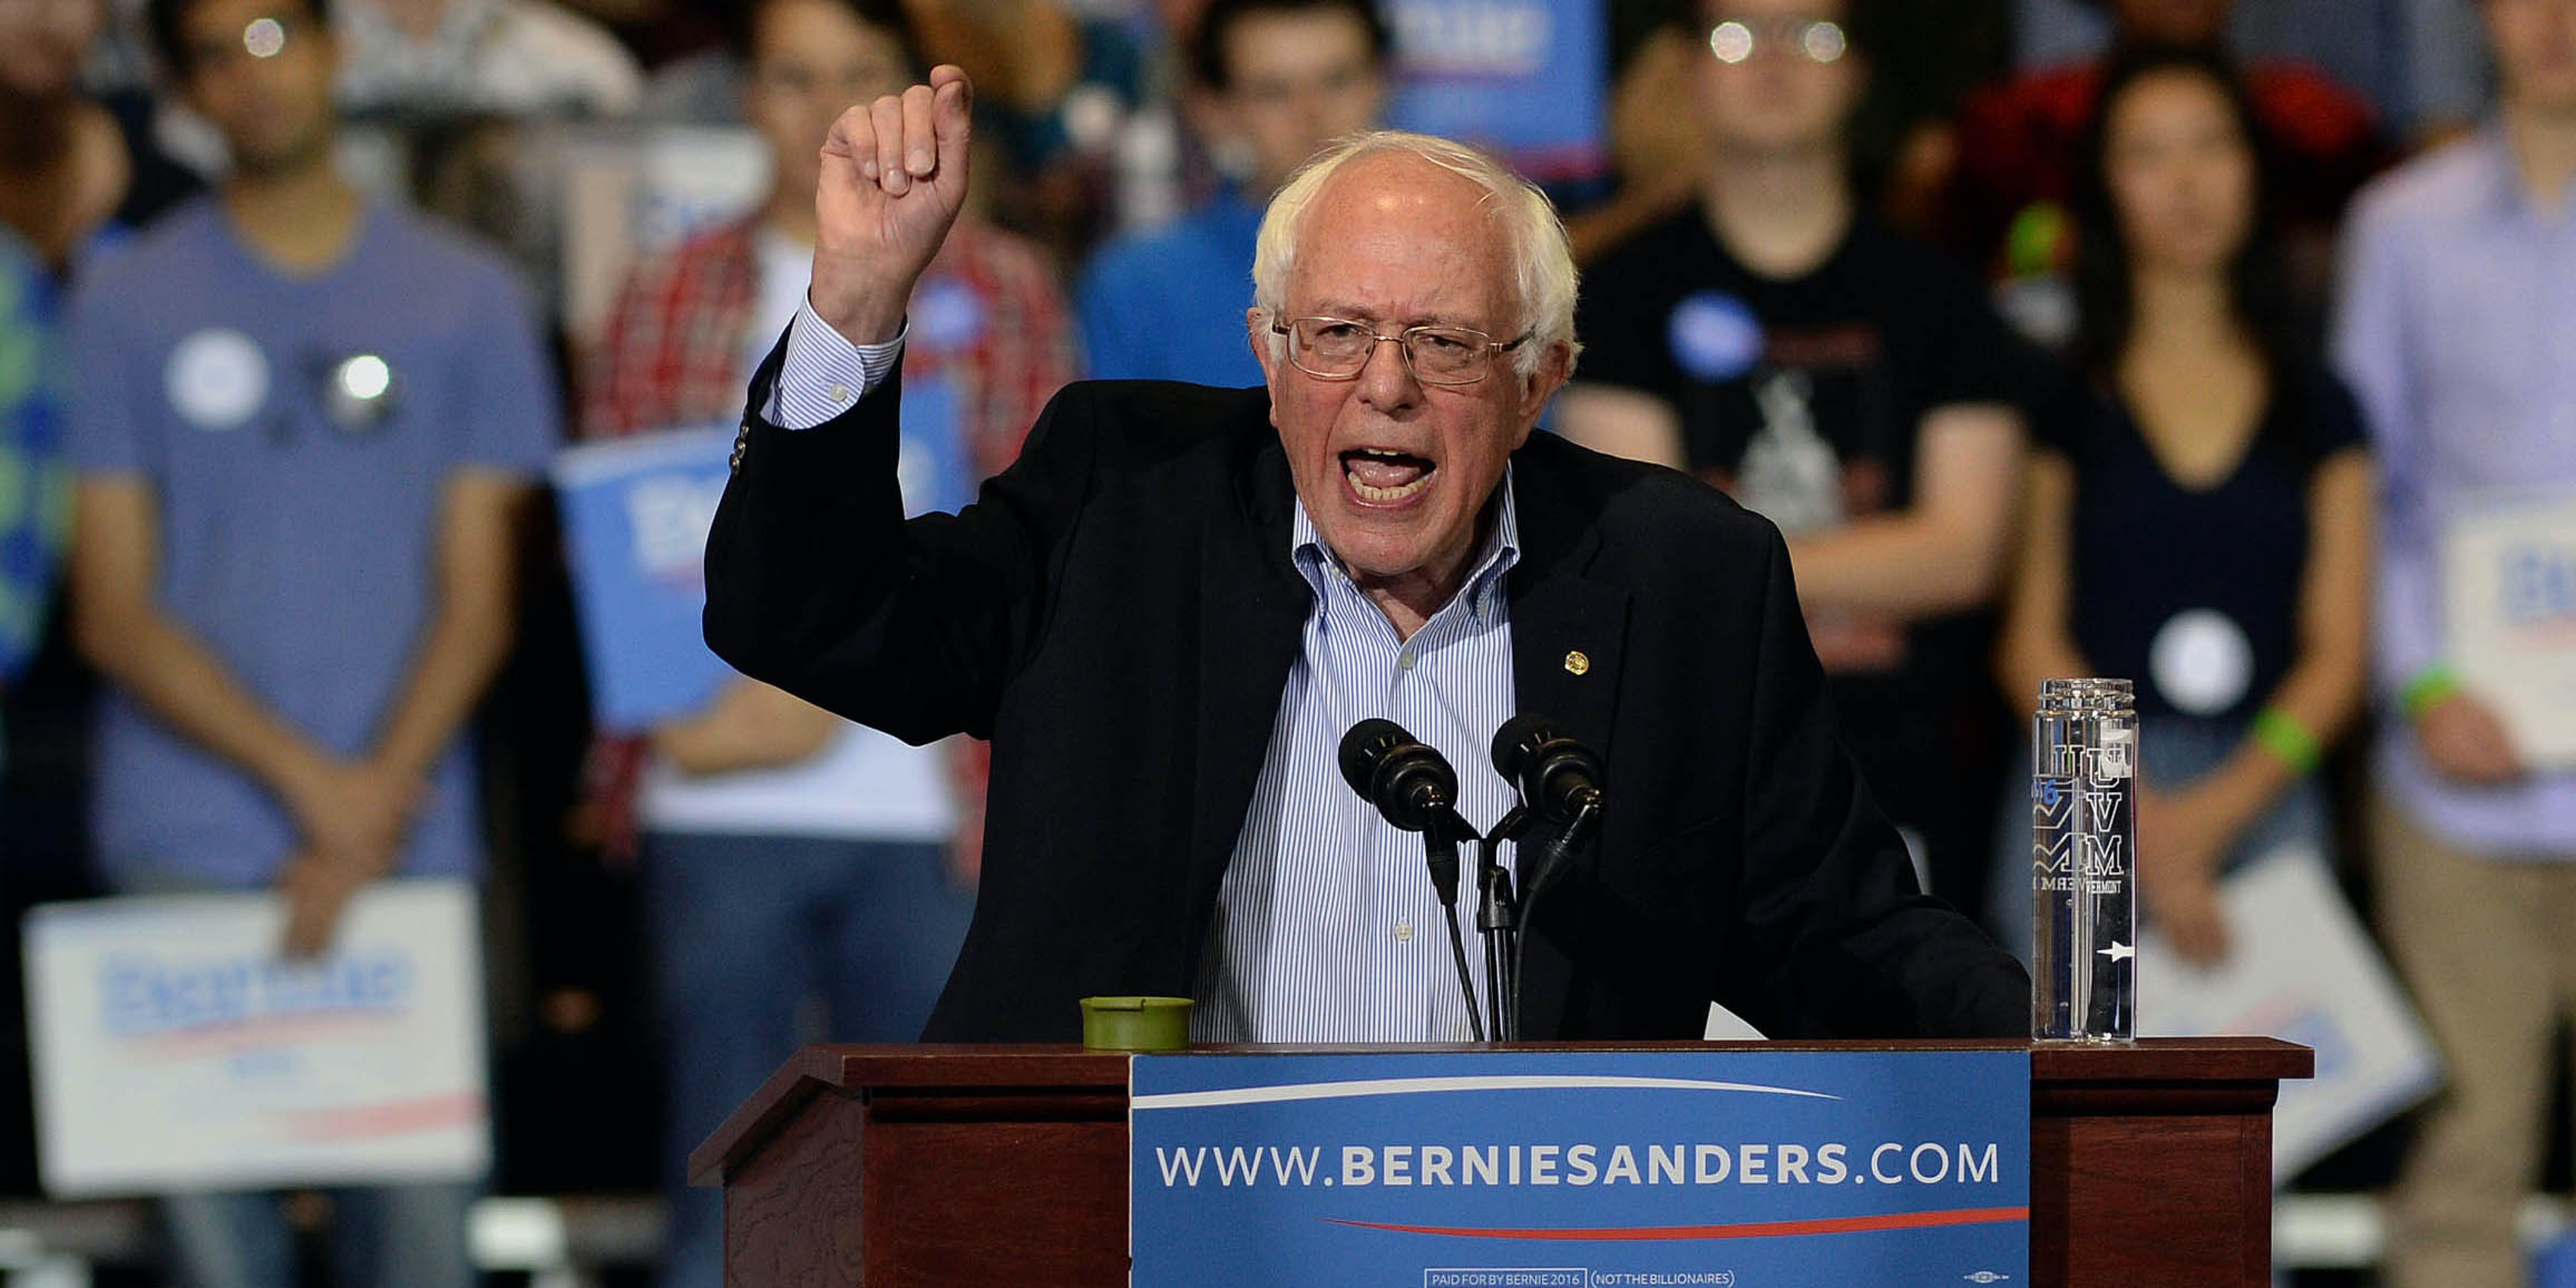 Bernie Sanders Becomes First Senator to Officially Propose Federal Marijuana Decriminalization